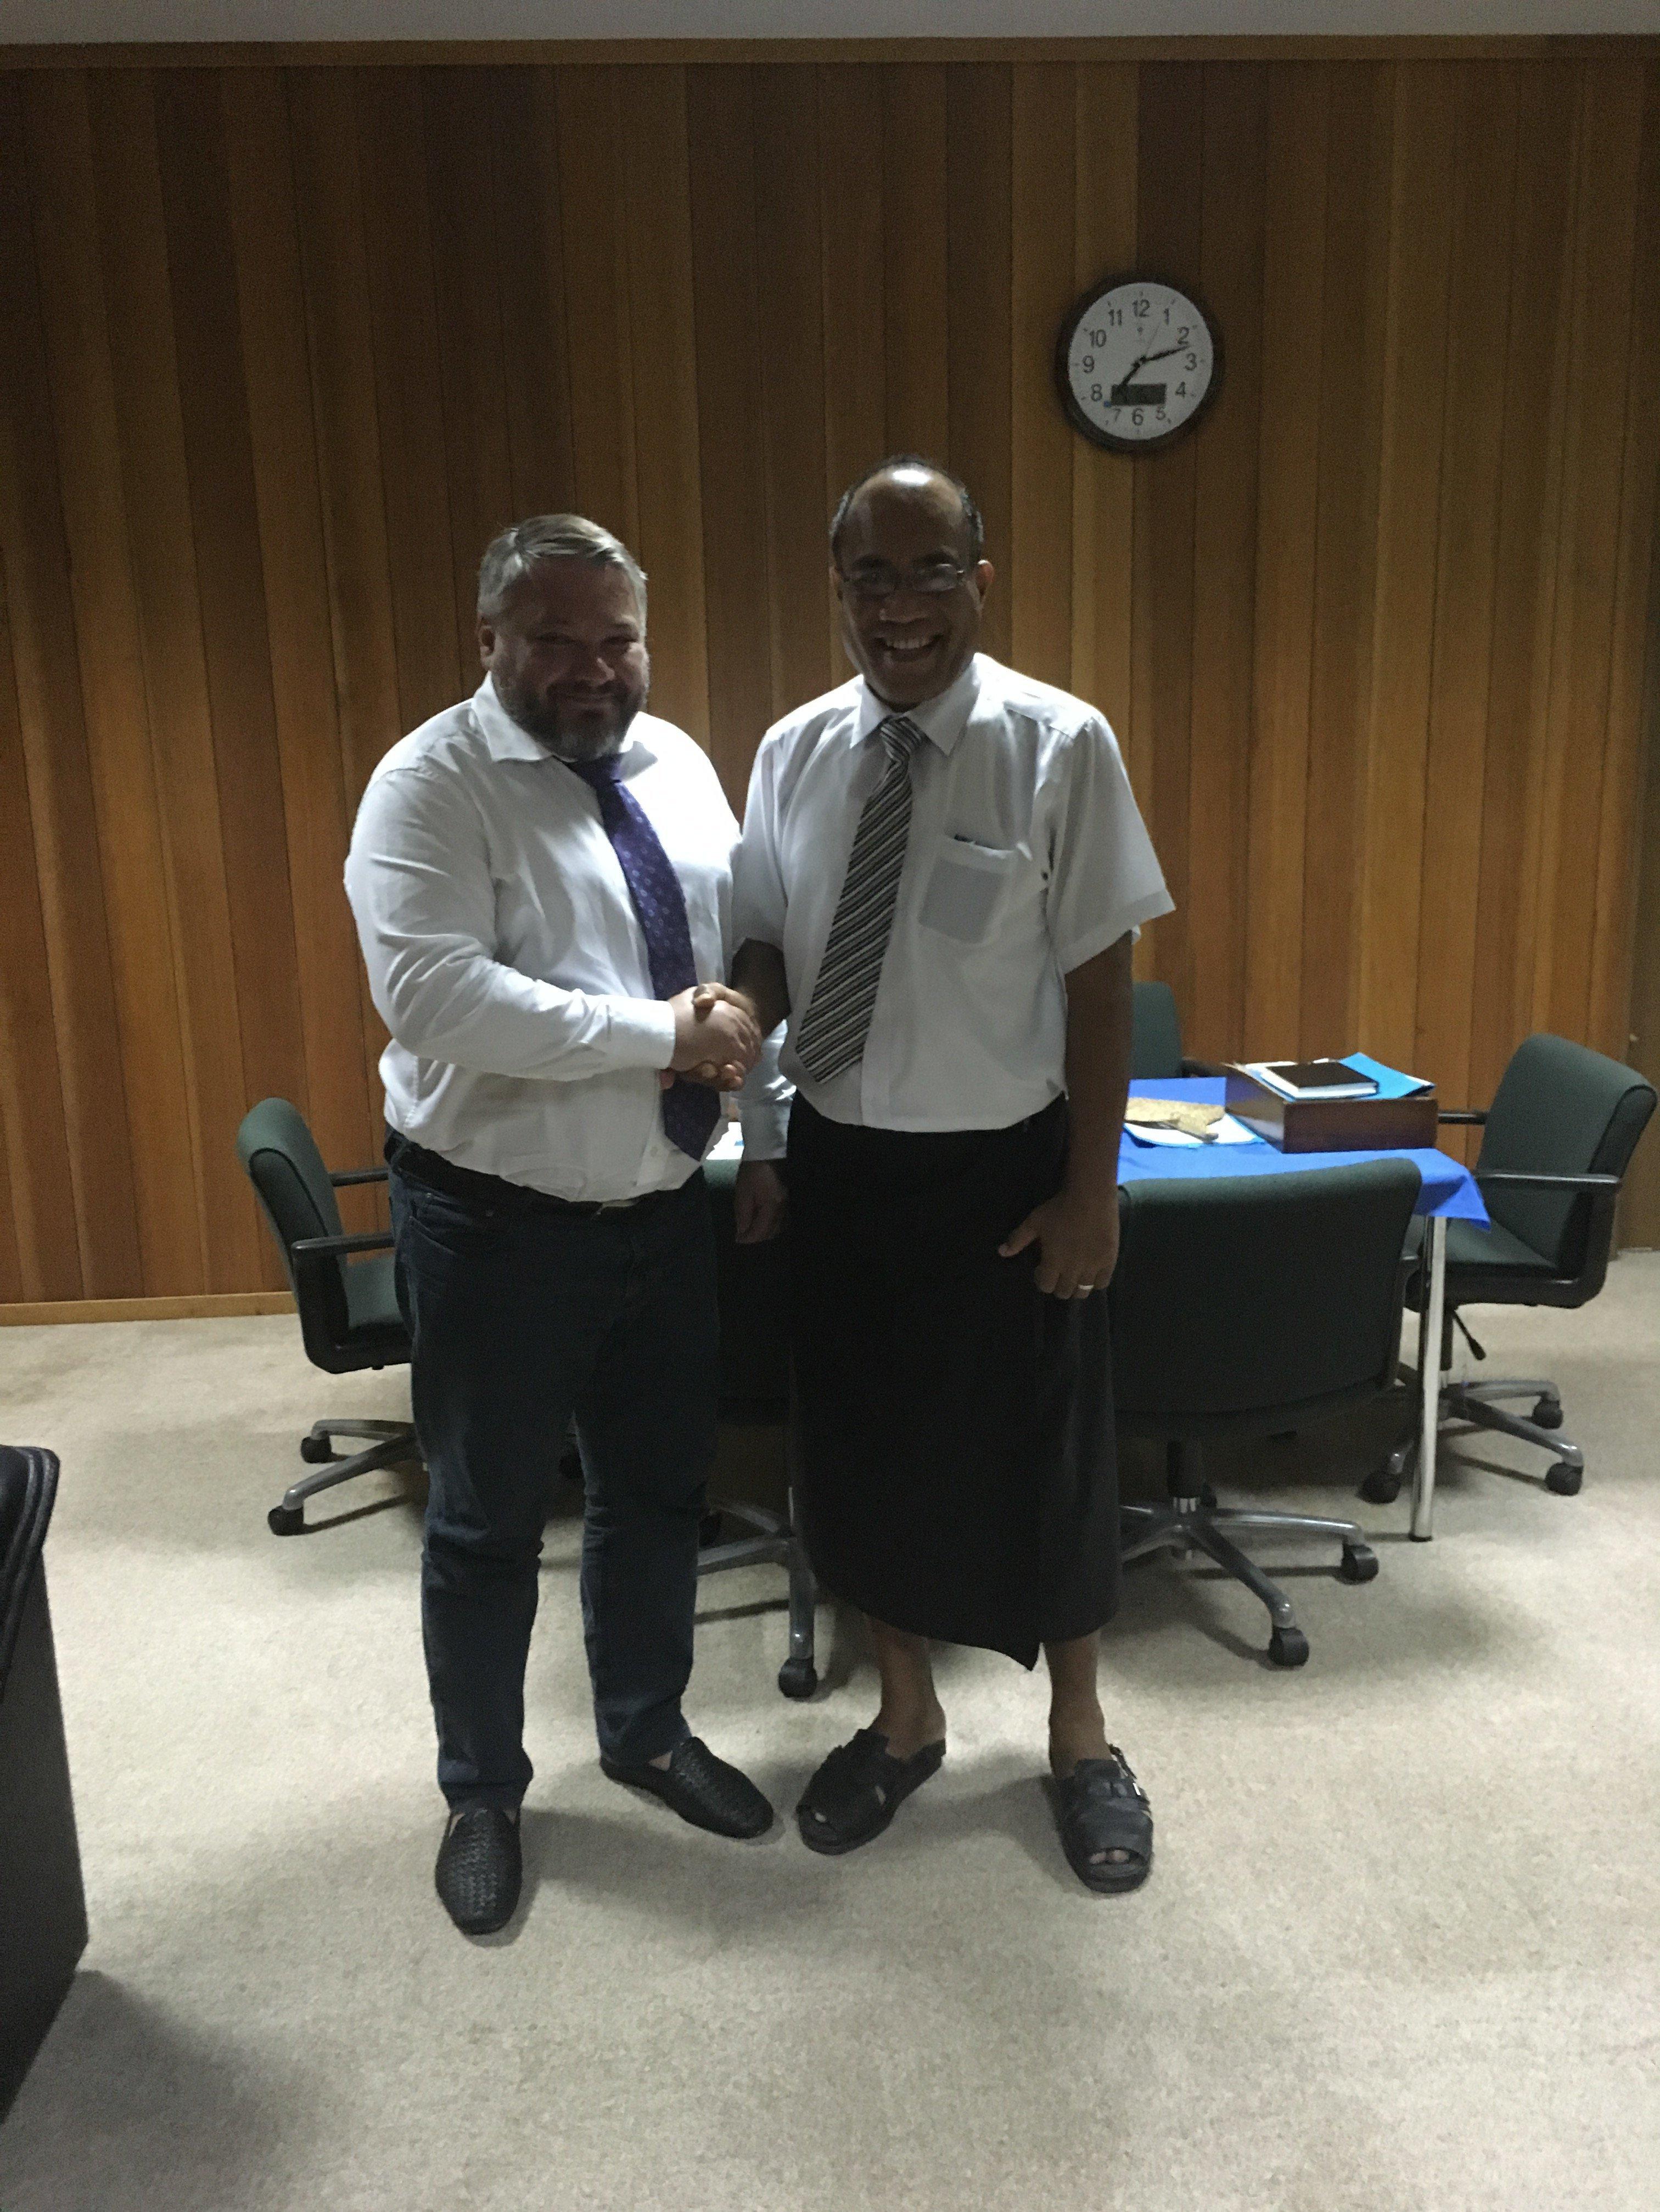 Anton Bakov and Kiribati President Taneti Mamau during talks